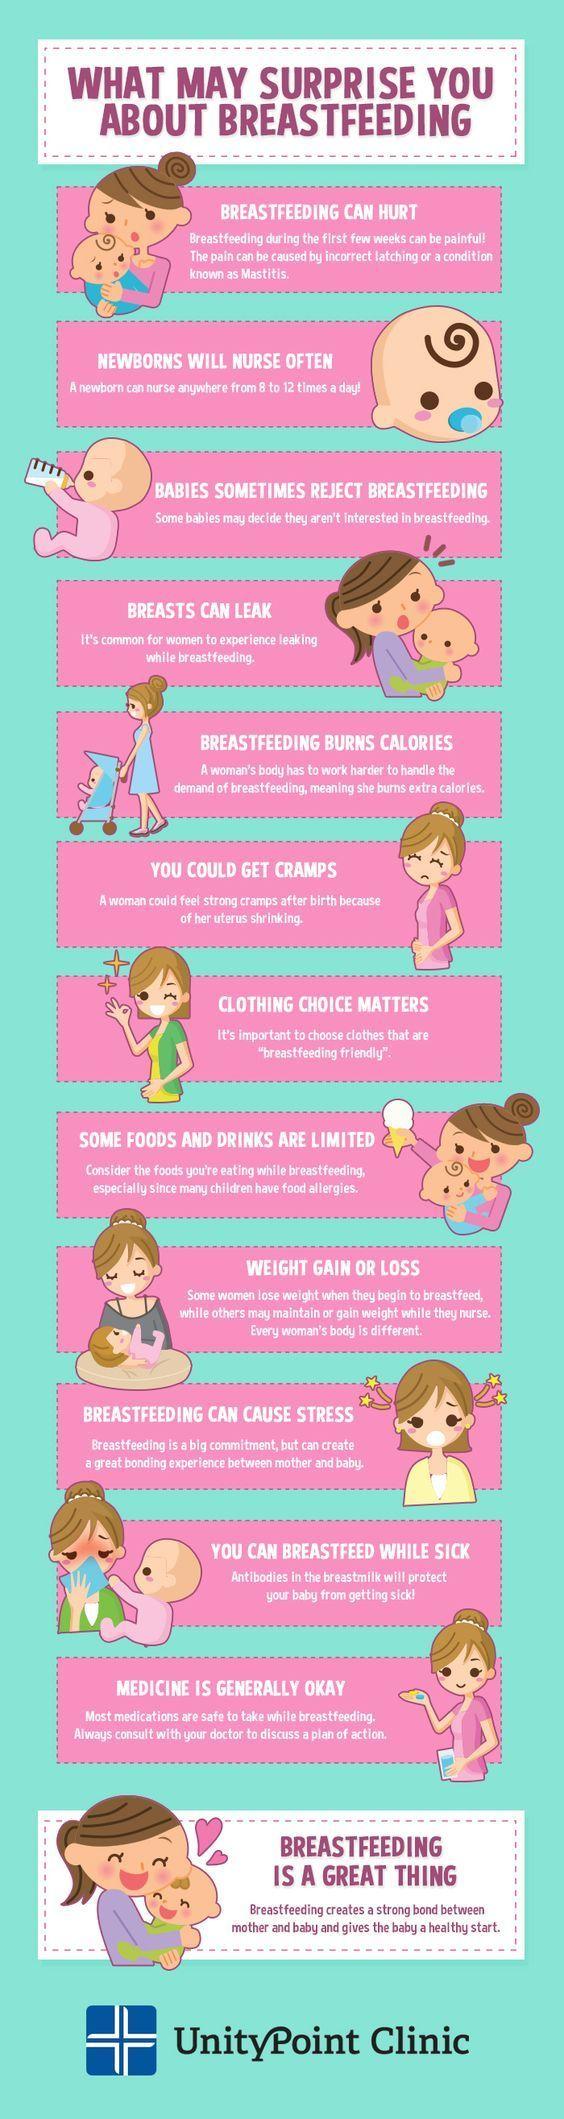 27 Helpful Charts For Breastfeeding Moms Loveliliya Breastfeeding Facts Breastfeeding Baby Breastfeeding